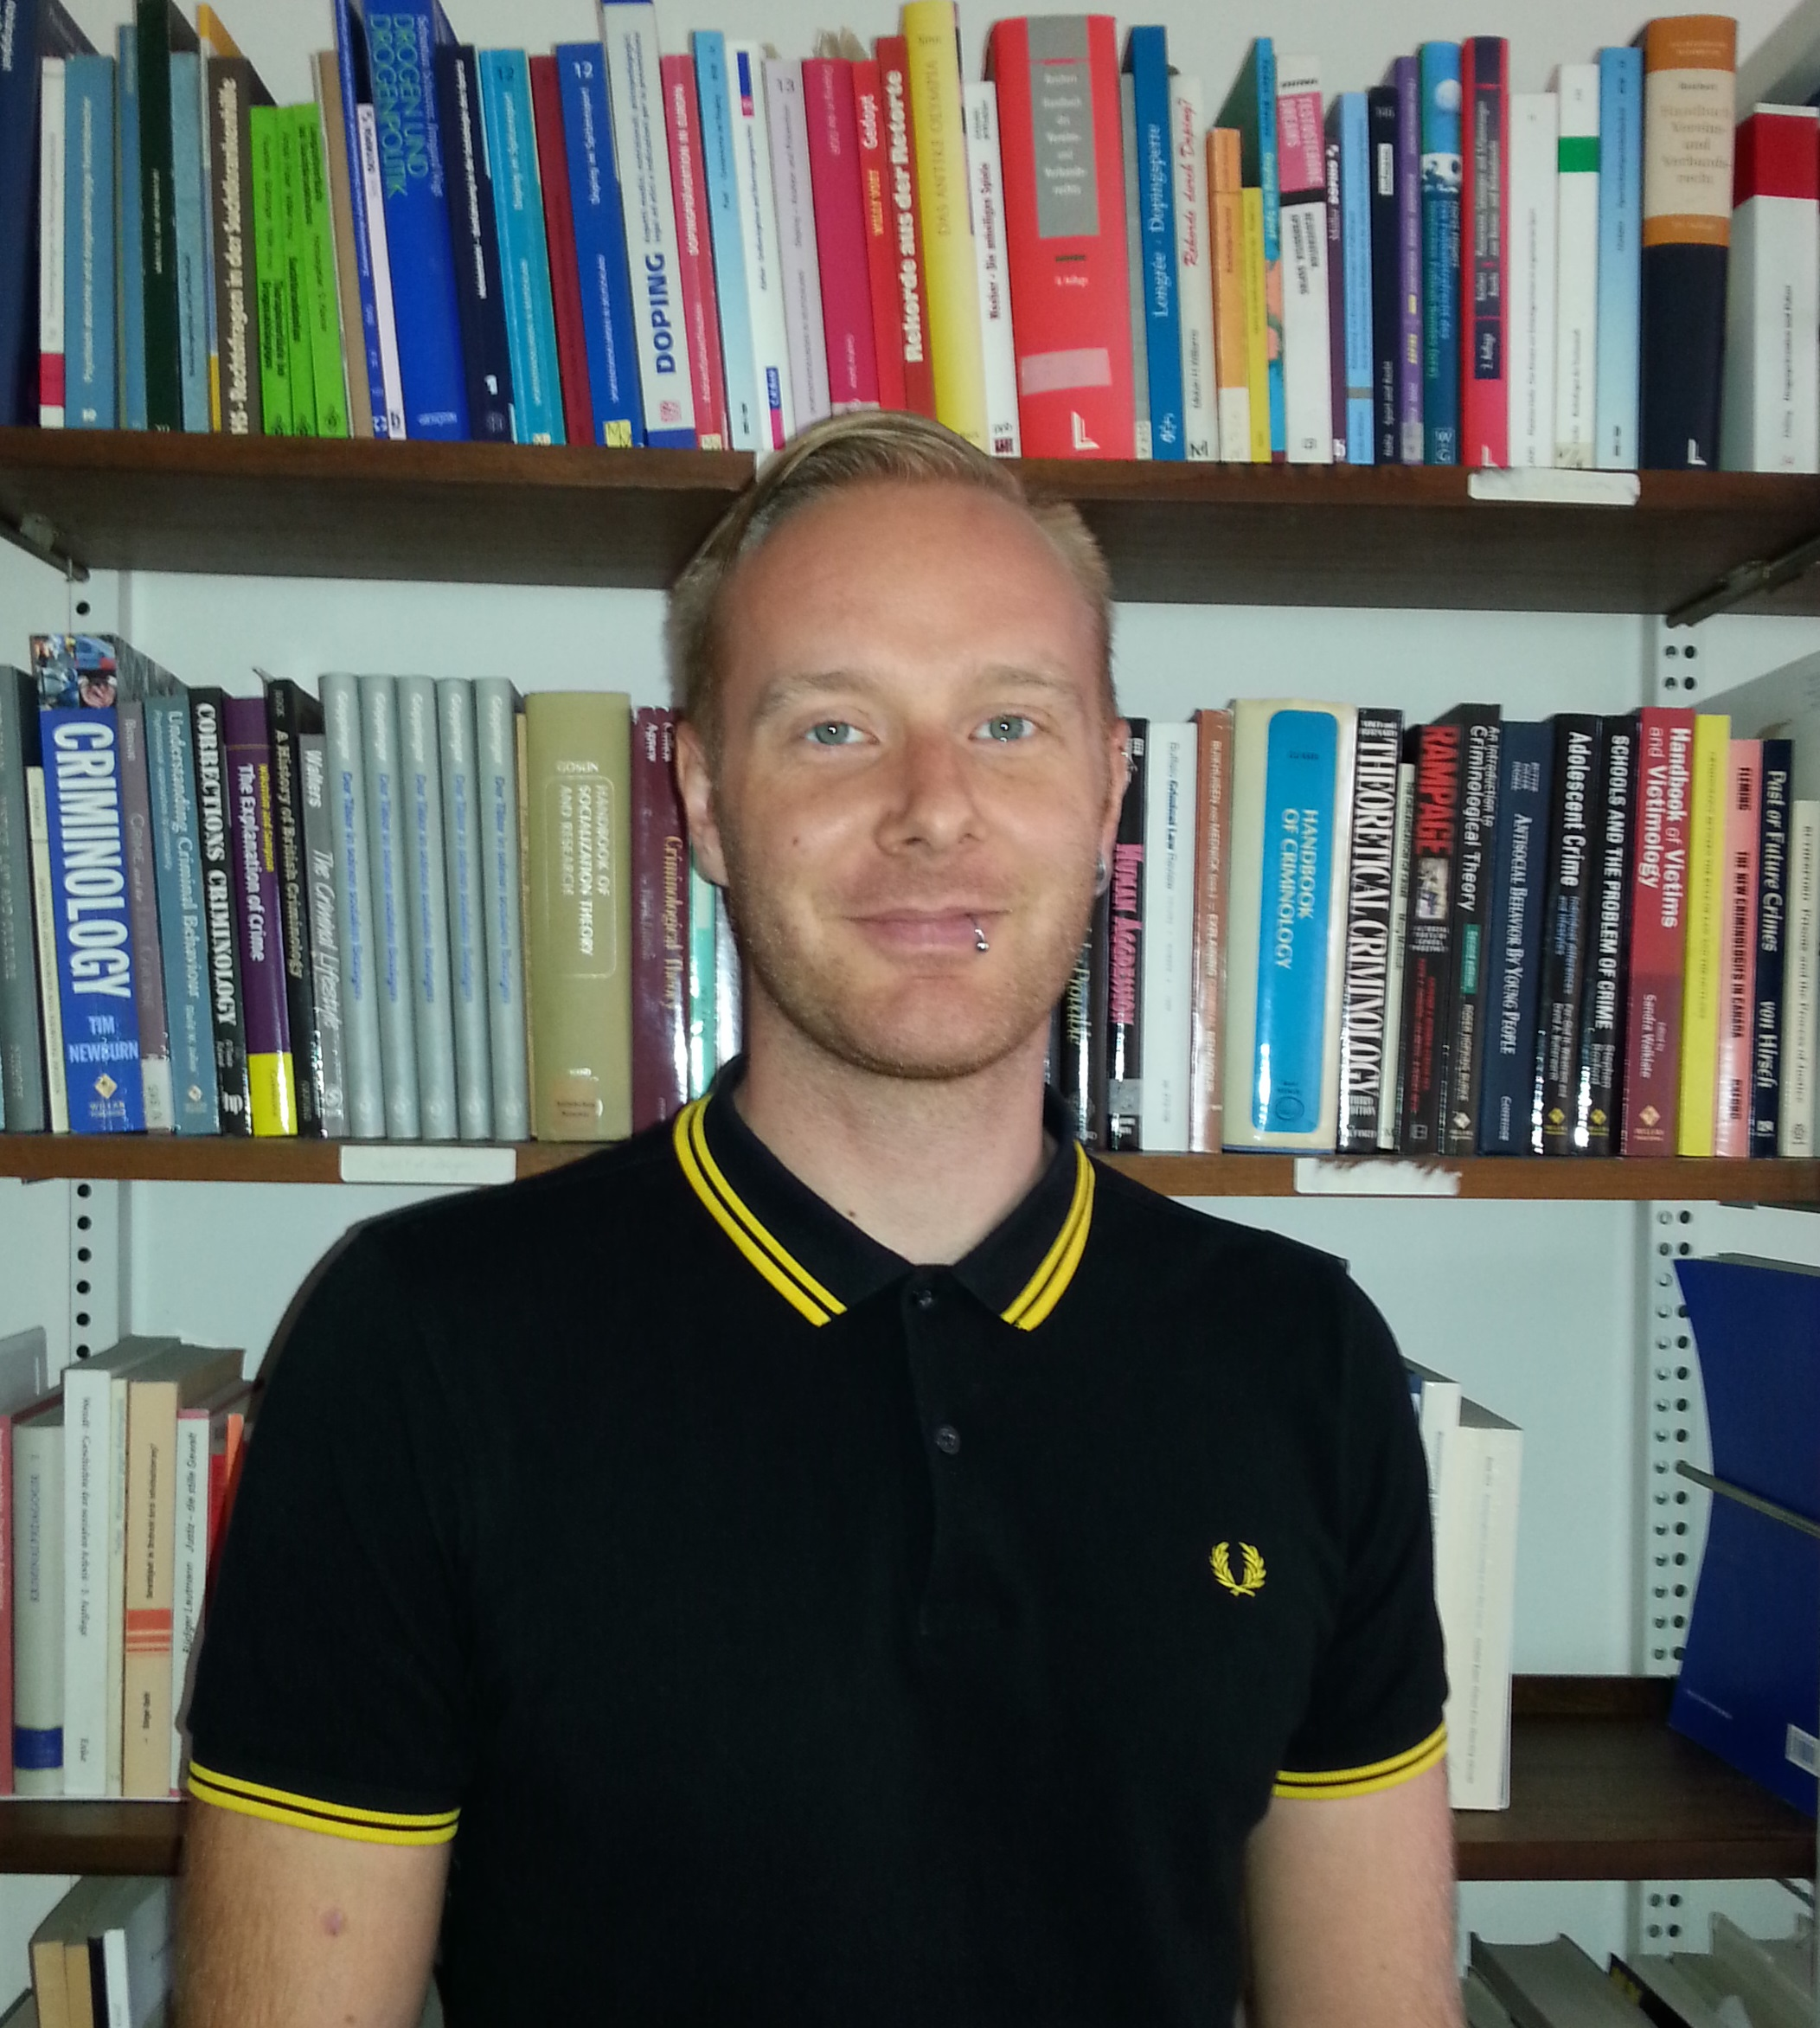 Jannik Rienhoff